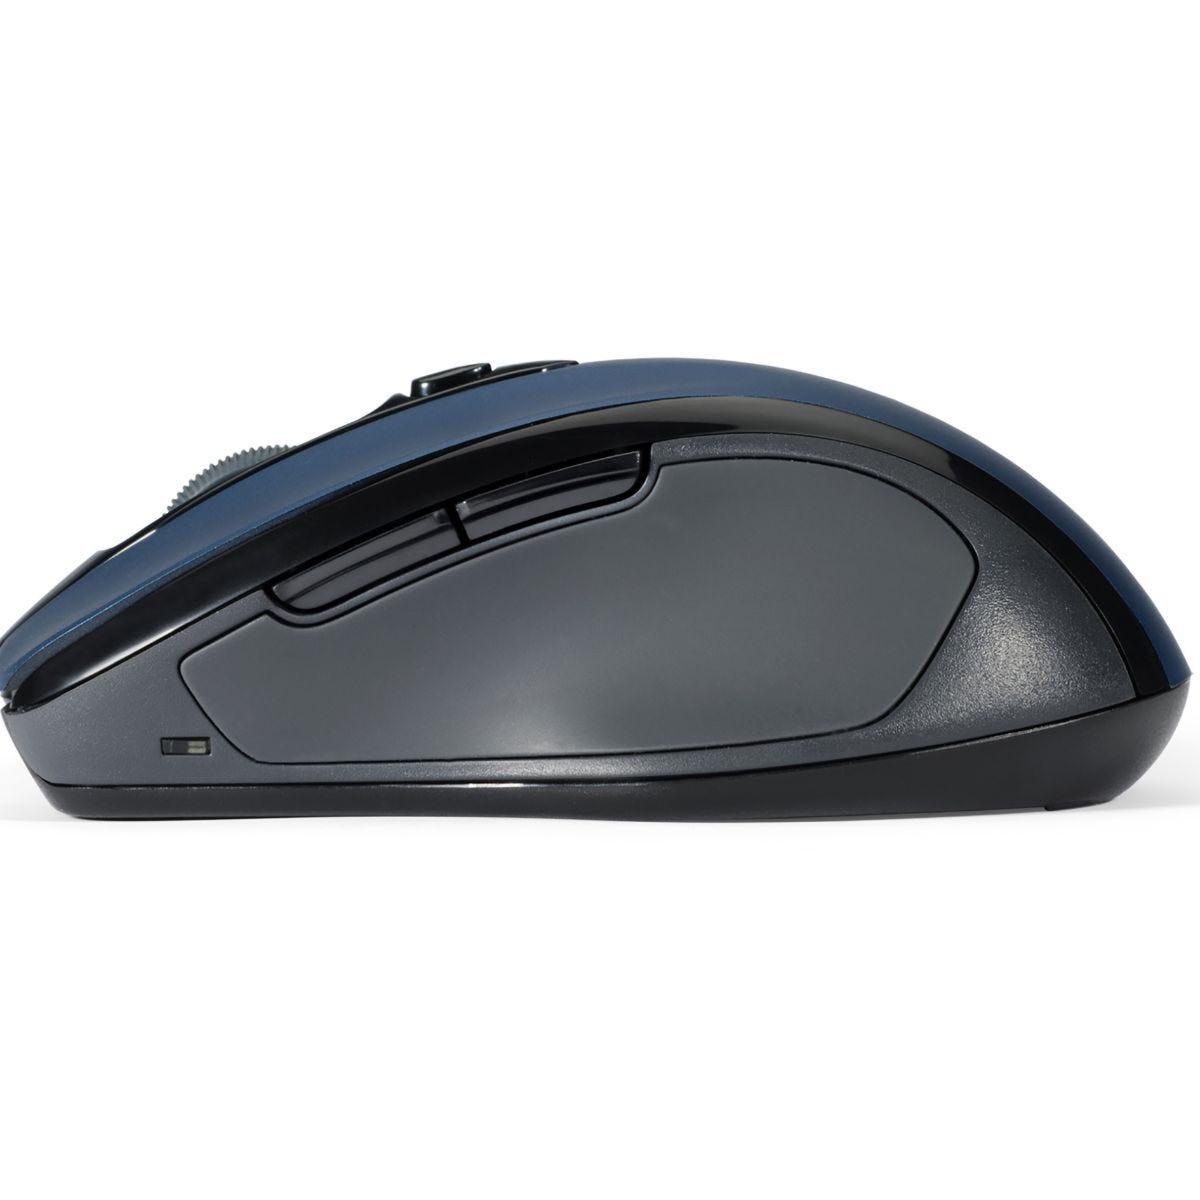 Kensington Pro Fit Mid-Size Wireless Mouse